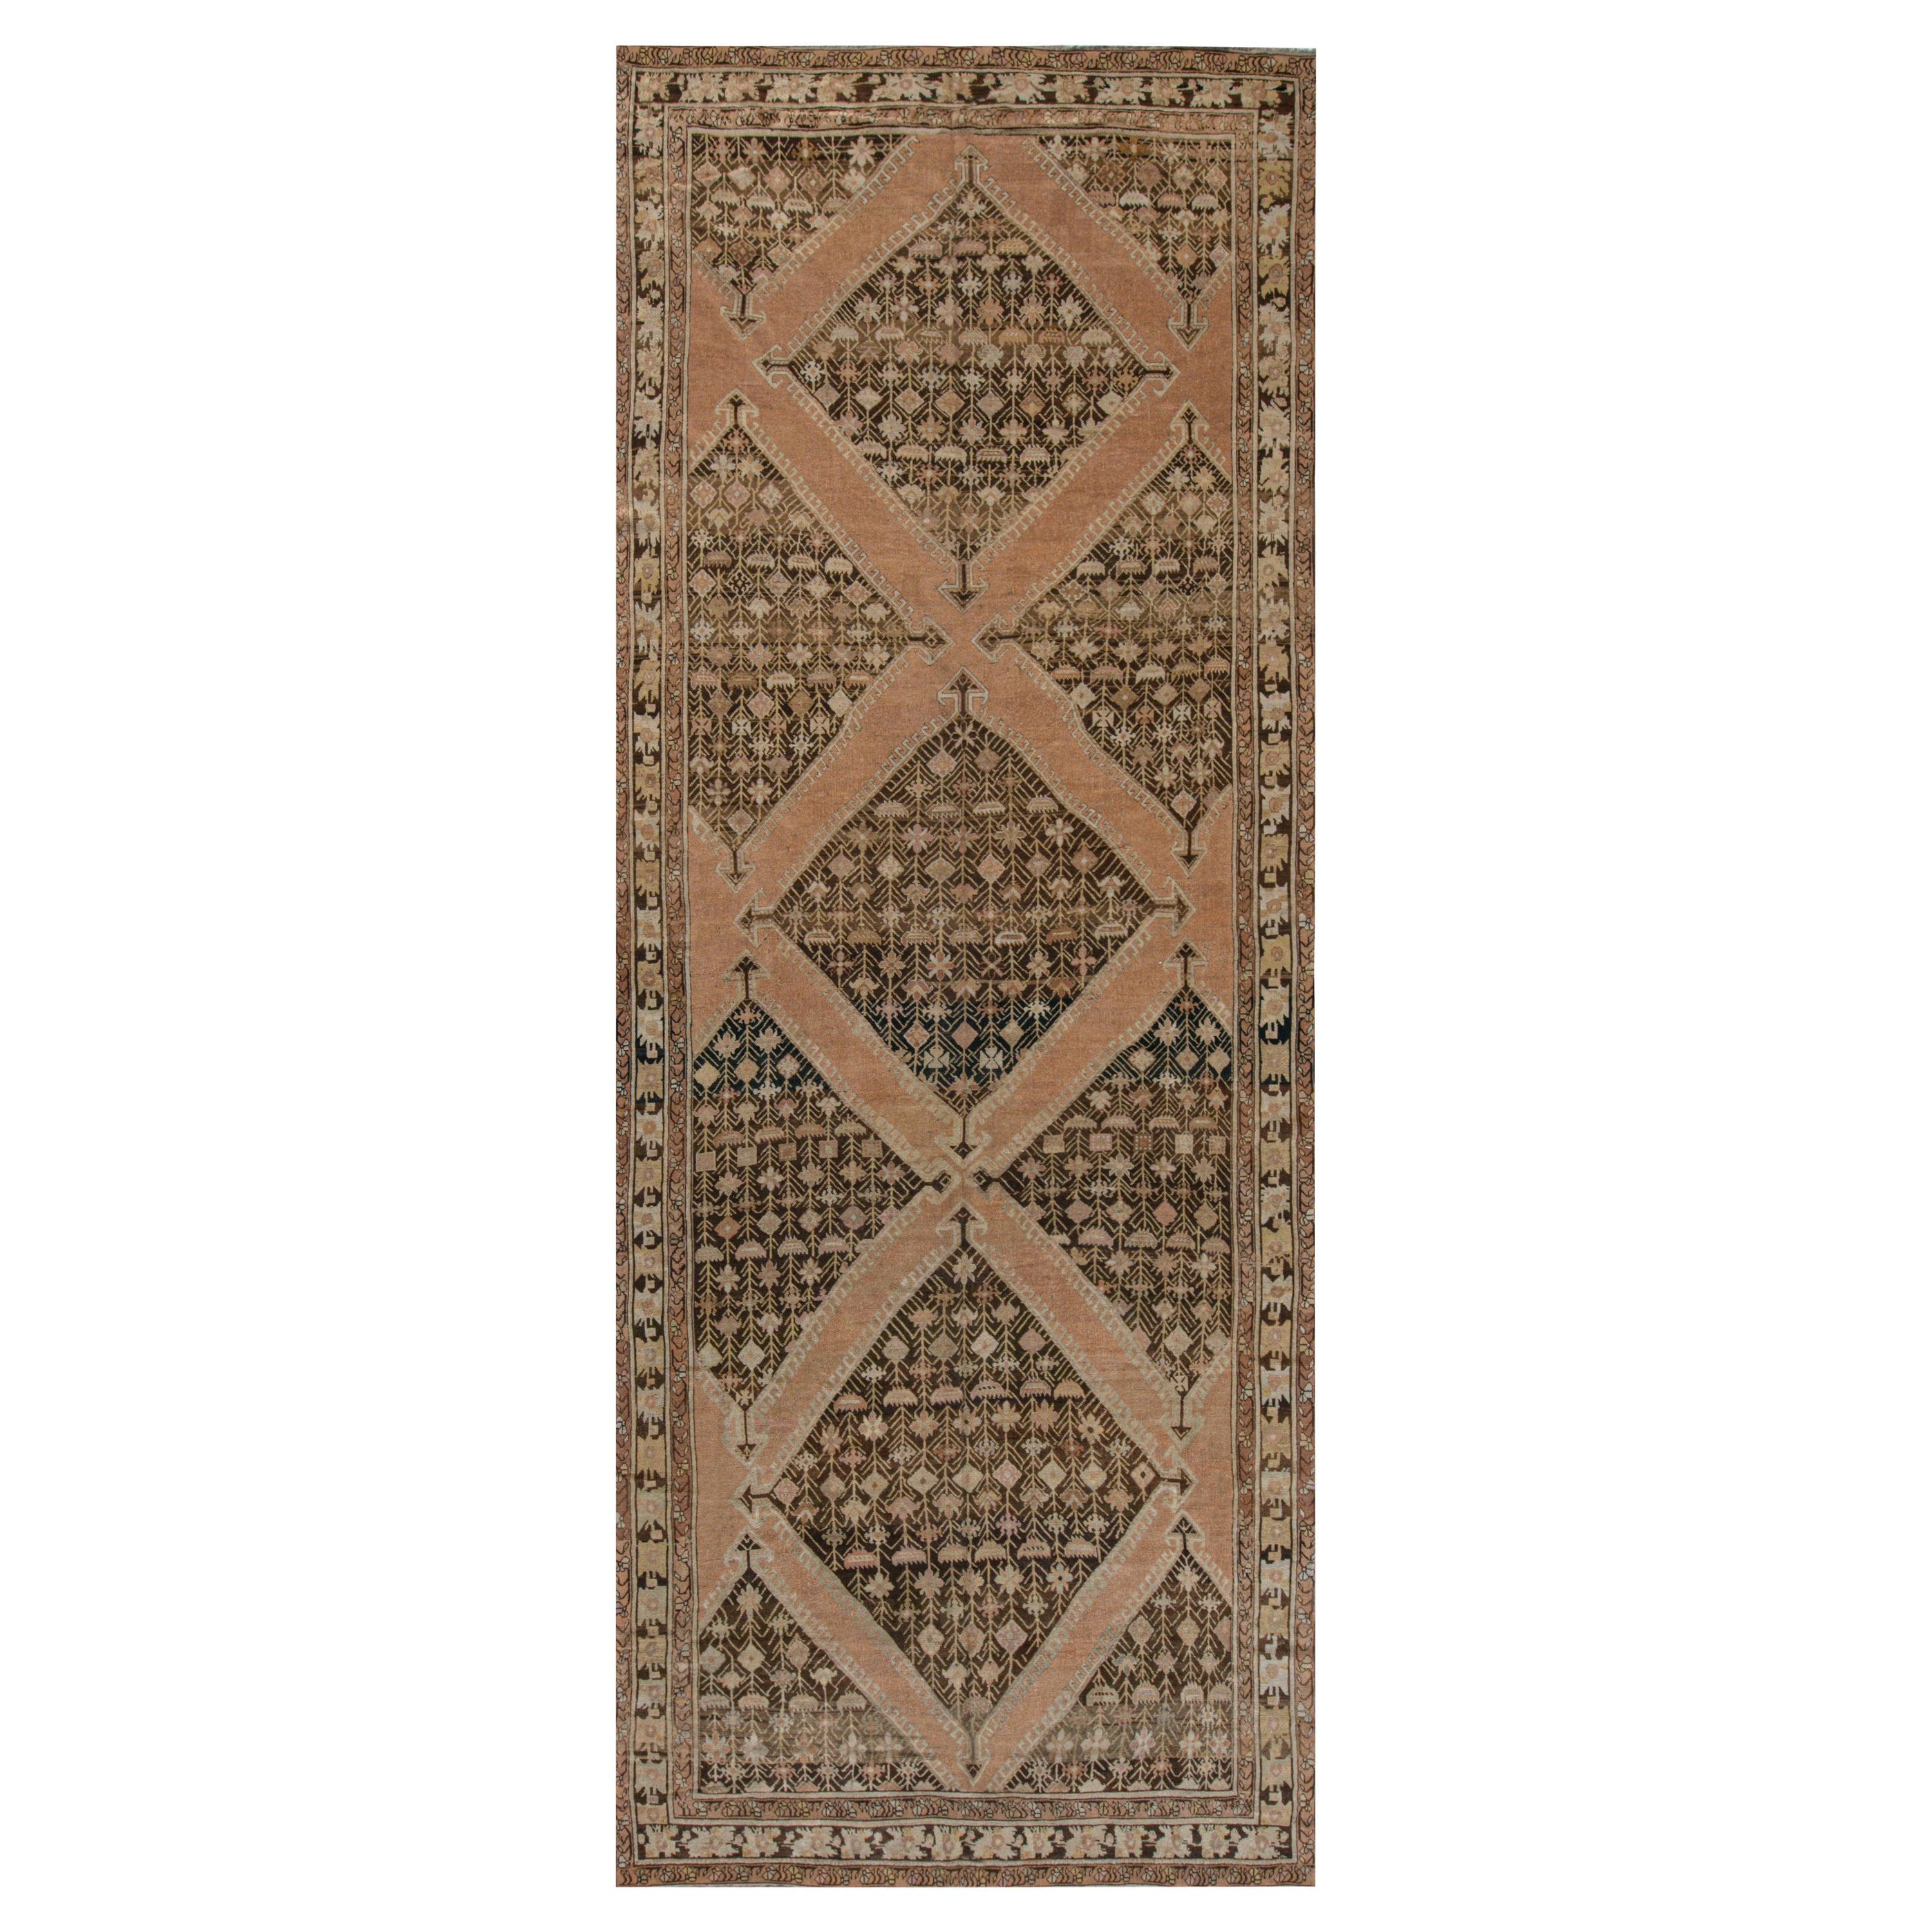 Antique Russian Karabagh Gallery Carpet